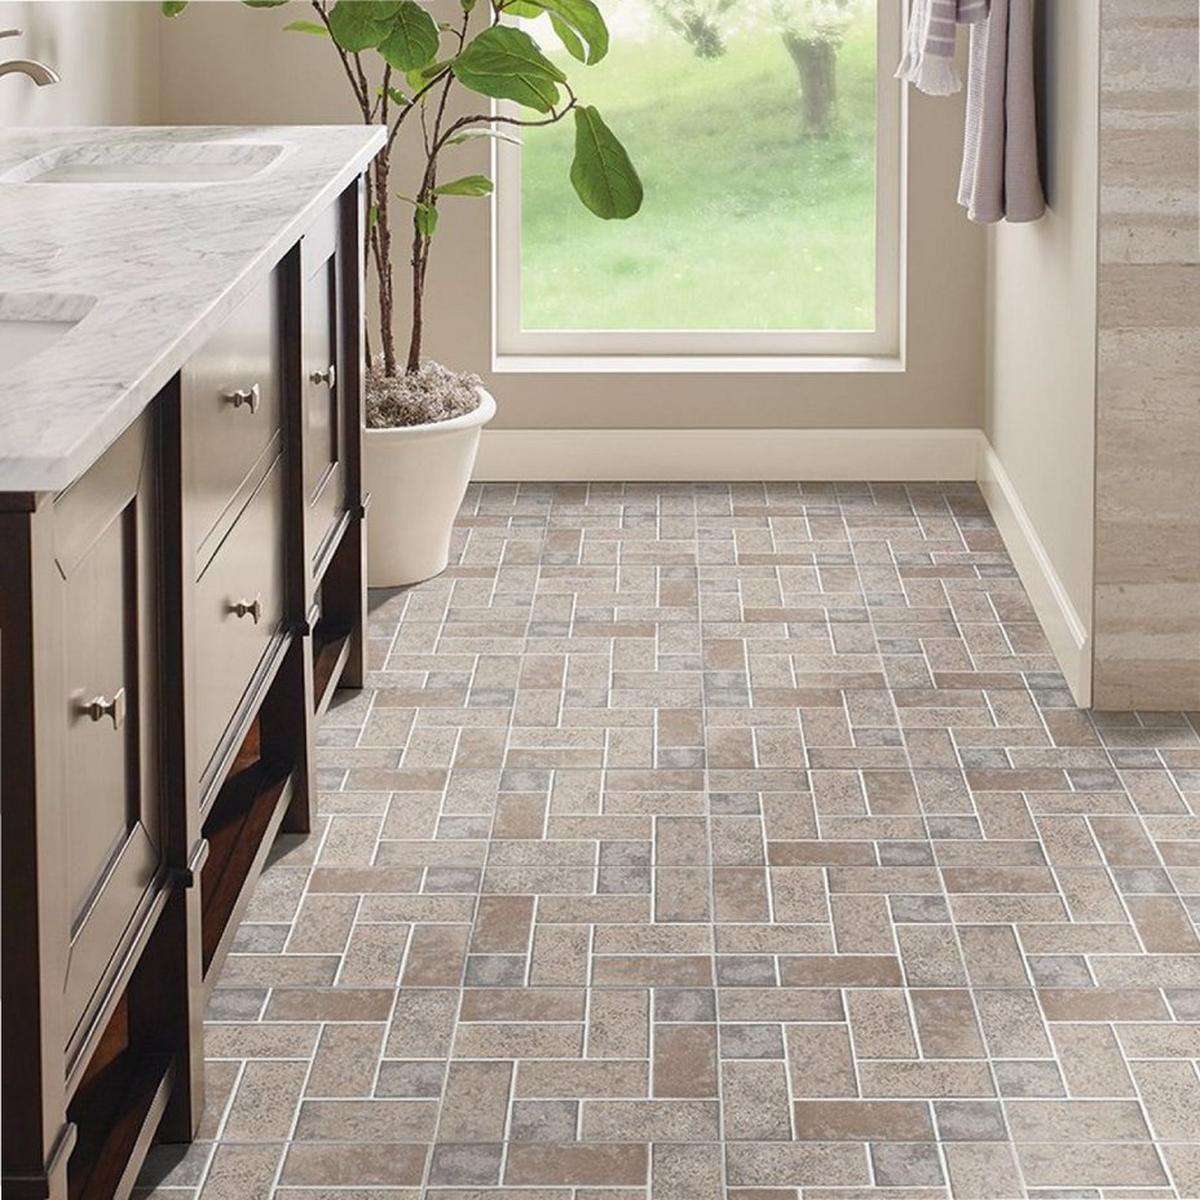 Tile on vinyl floor